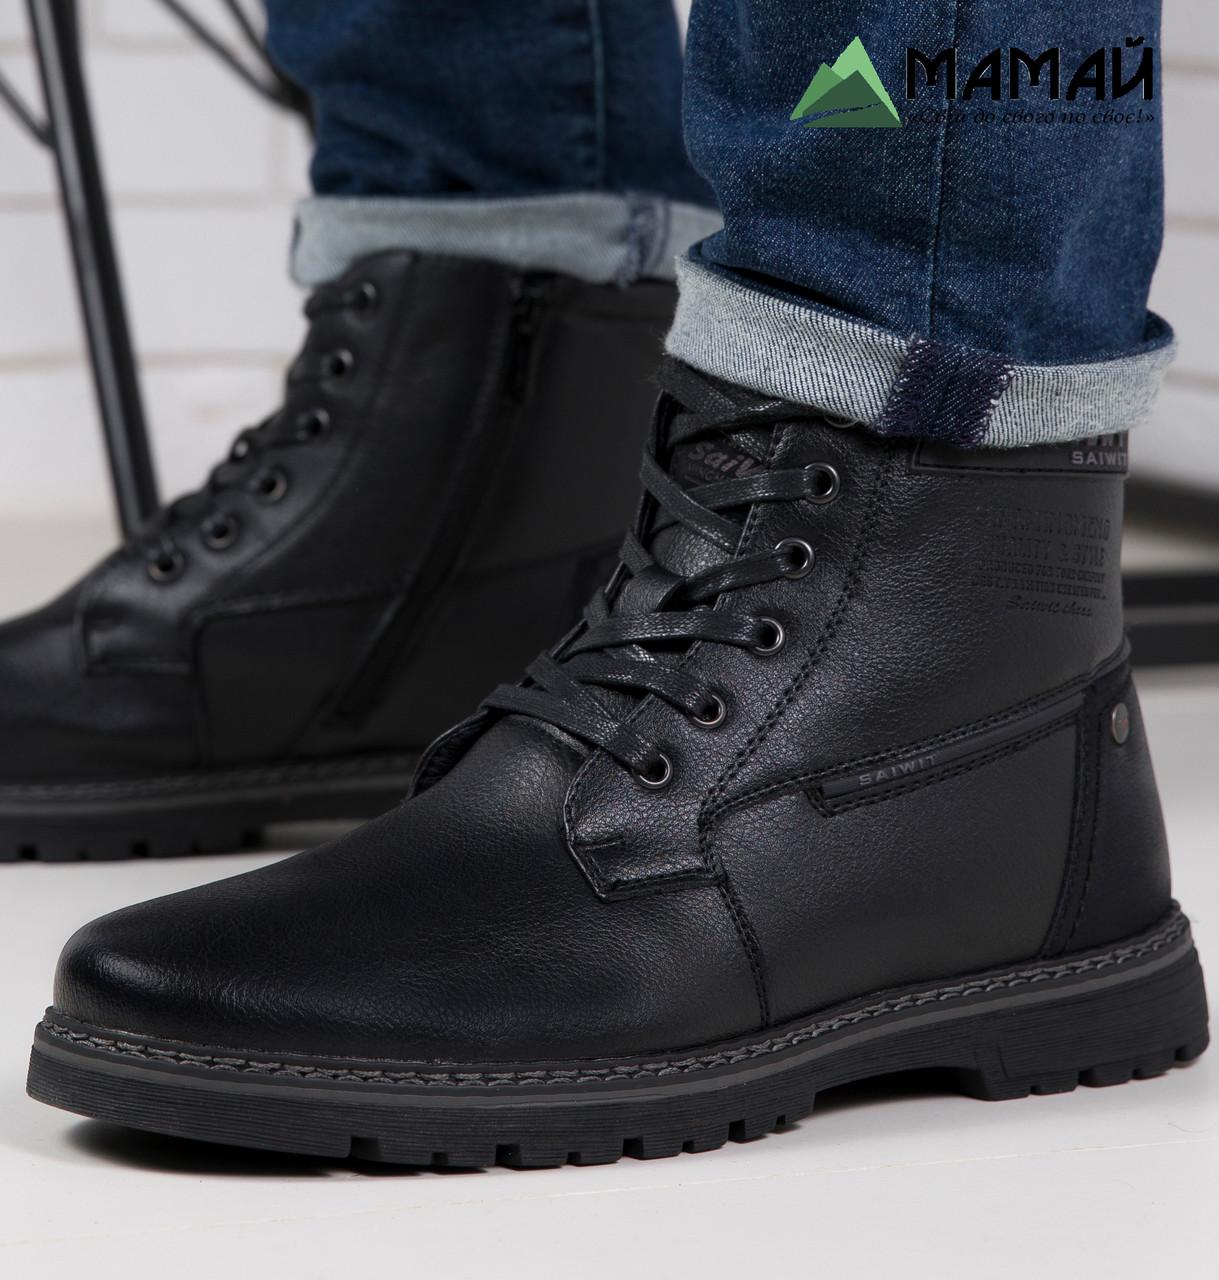 Ботинки мужские зимние -20 °C 45р